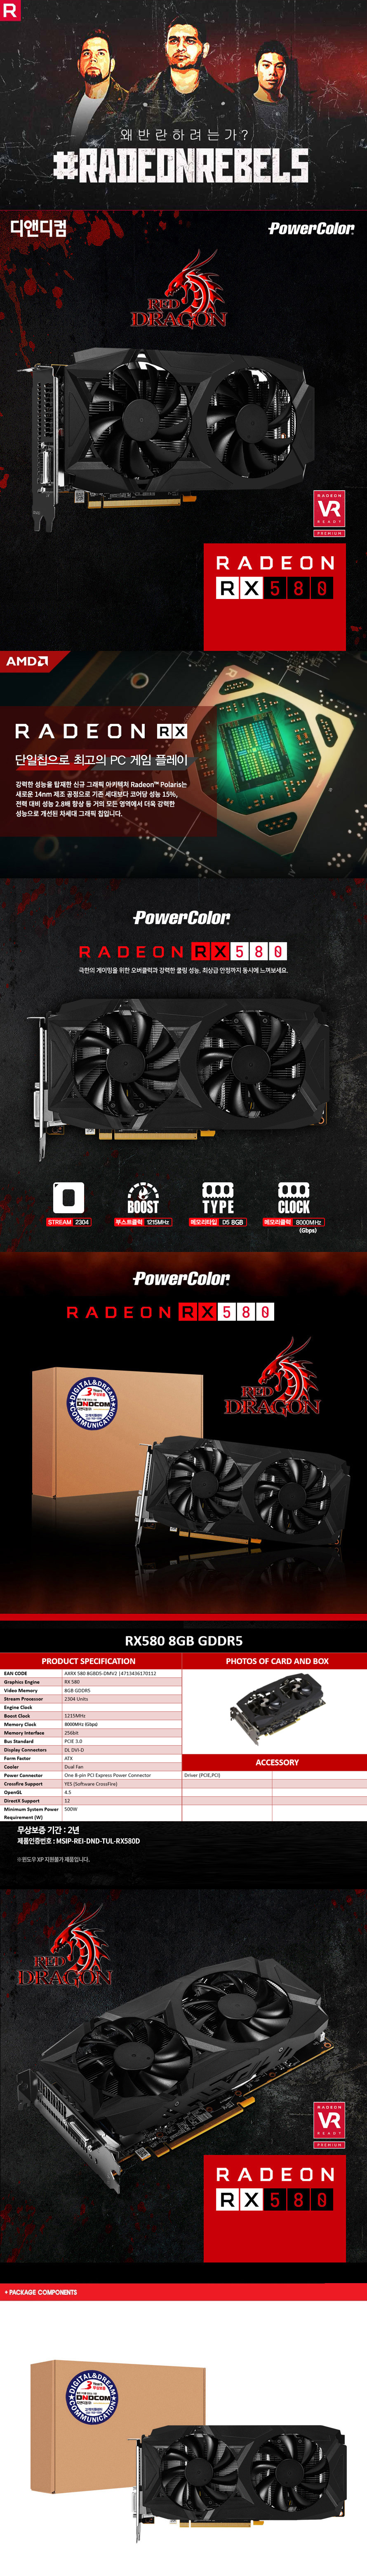 PowerColor  라데온 RX 580 D5 8GB 레드드래곤 디앤디컴 (벌크)